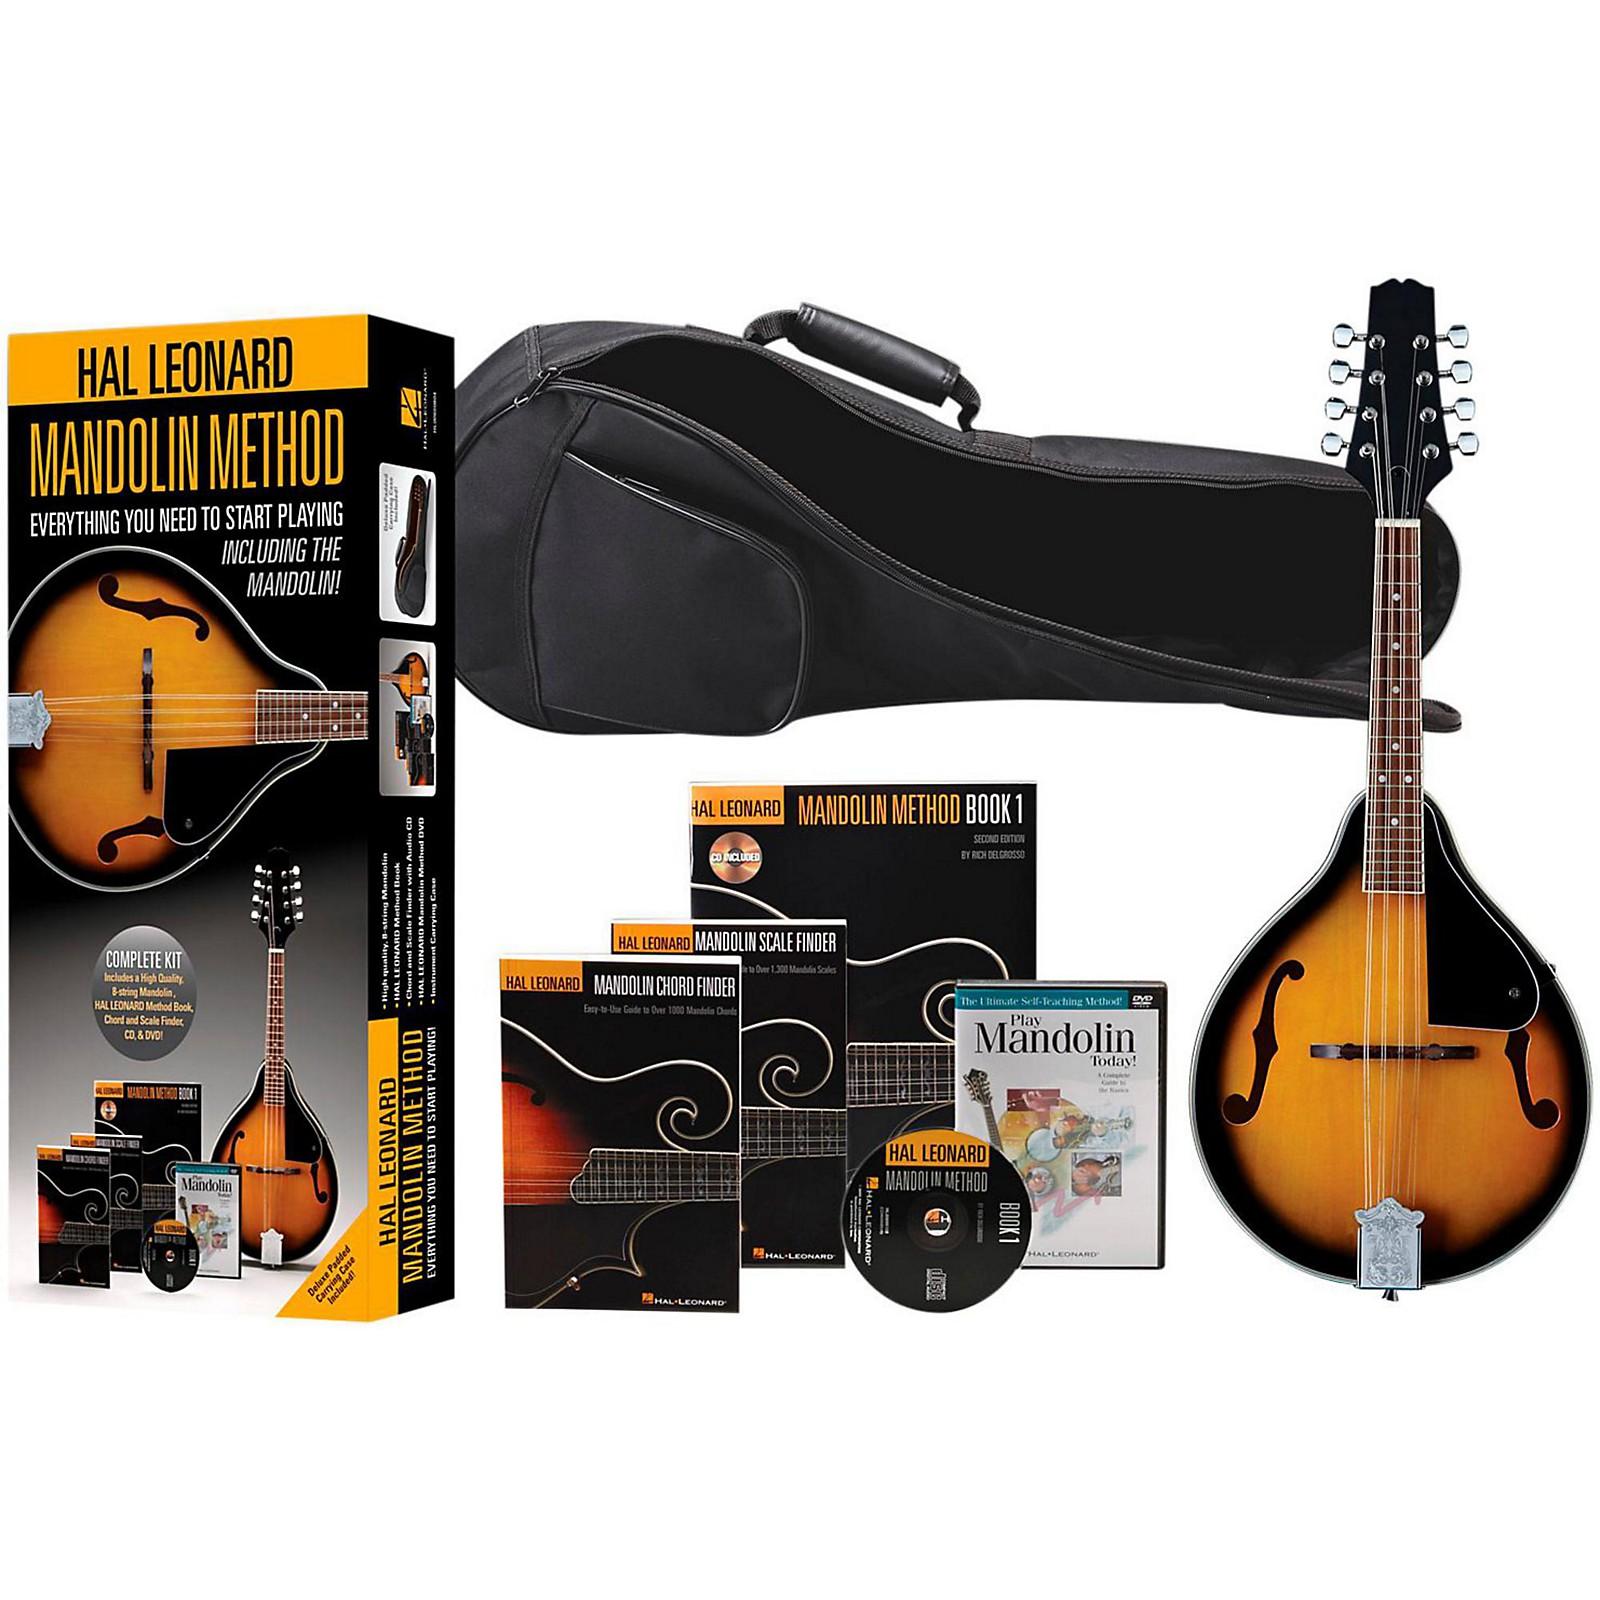 Hal Leonard Mandolin Starter Pack